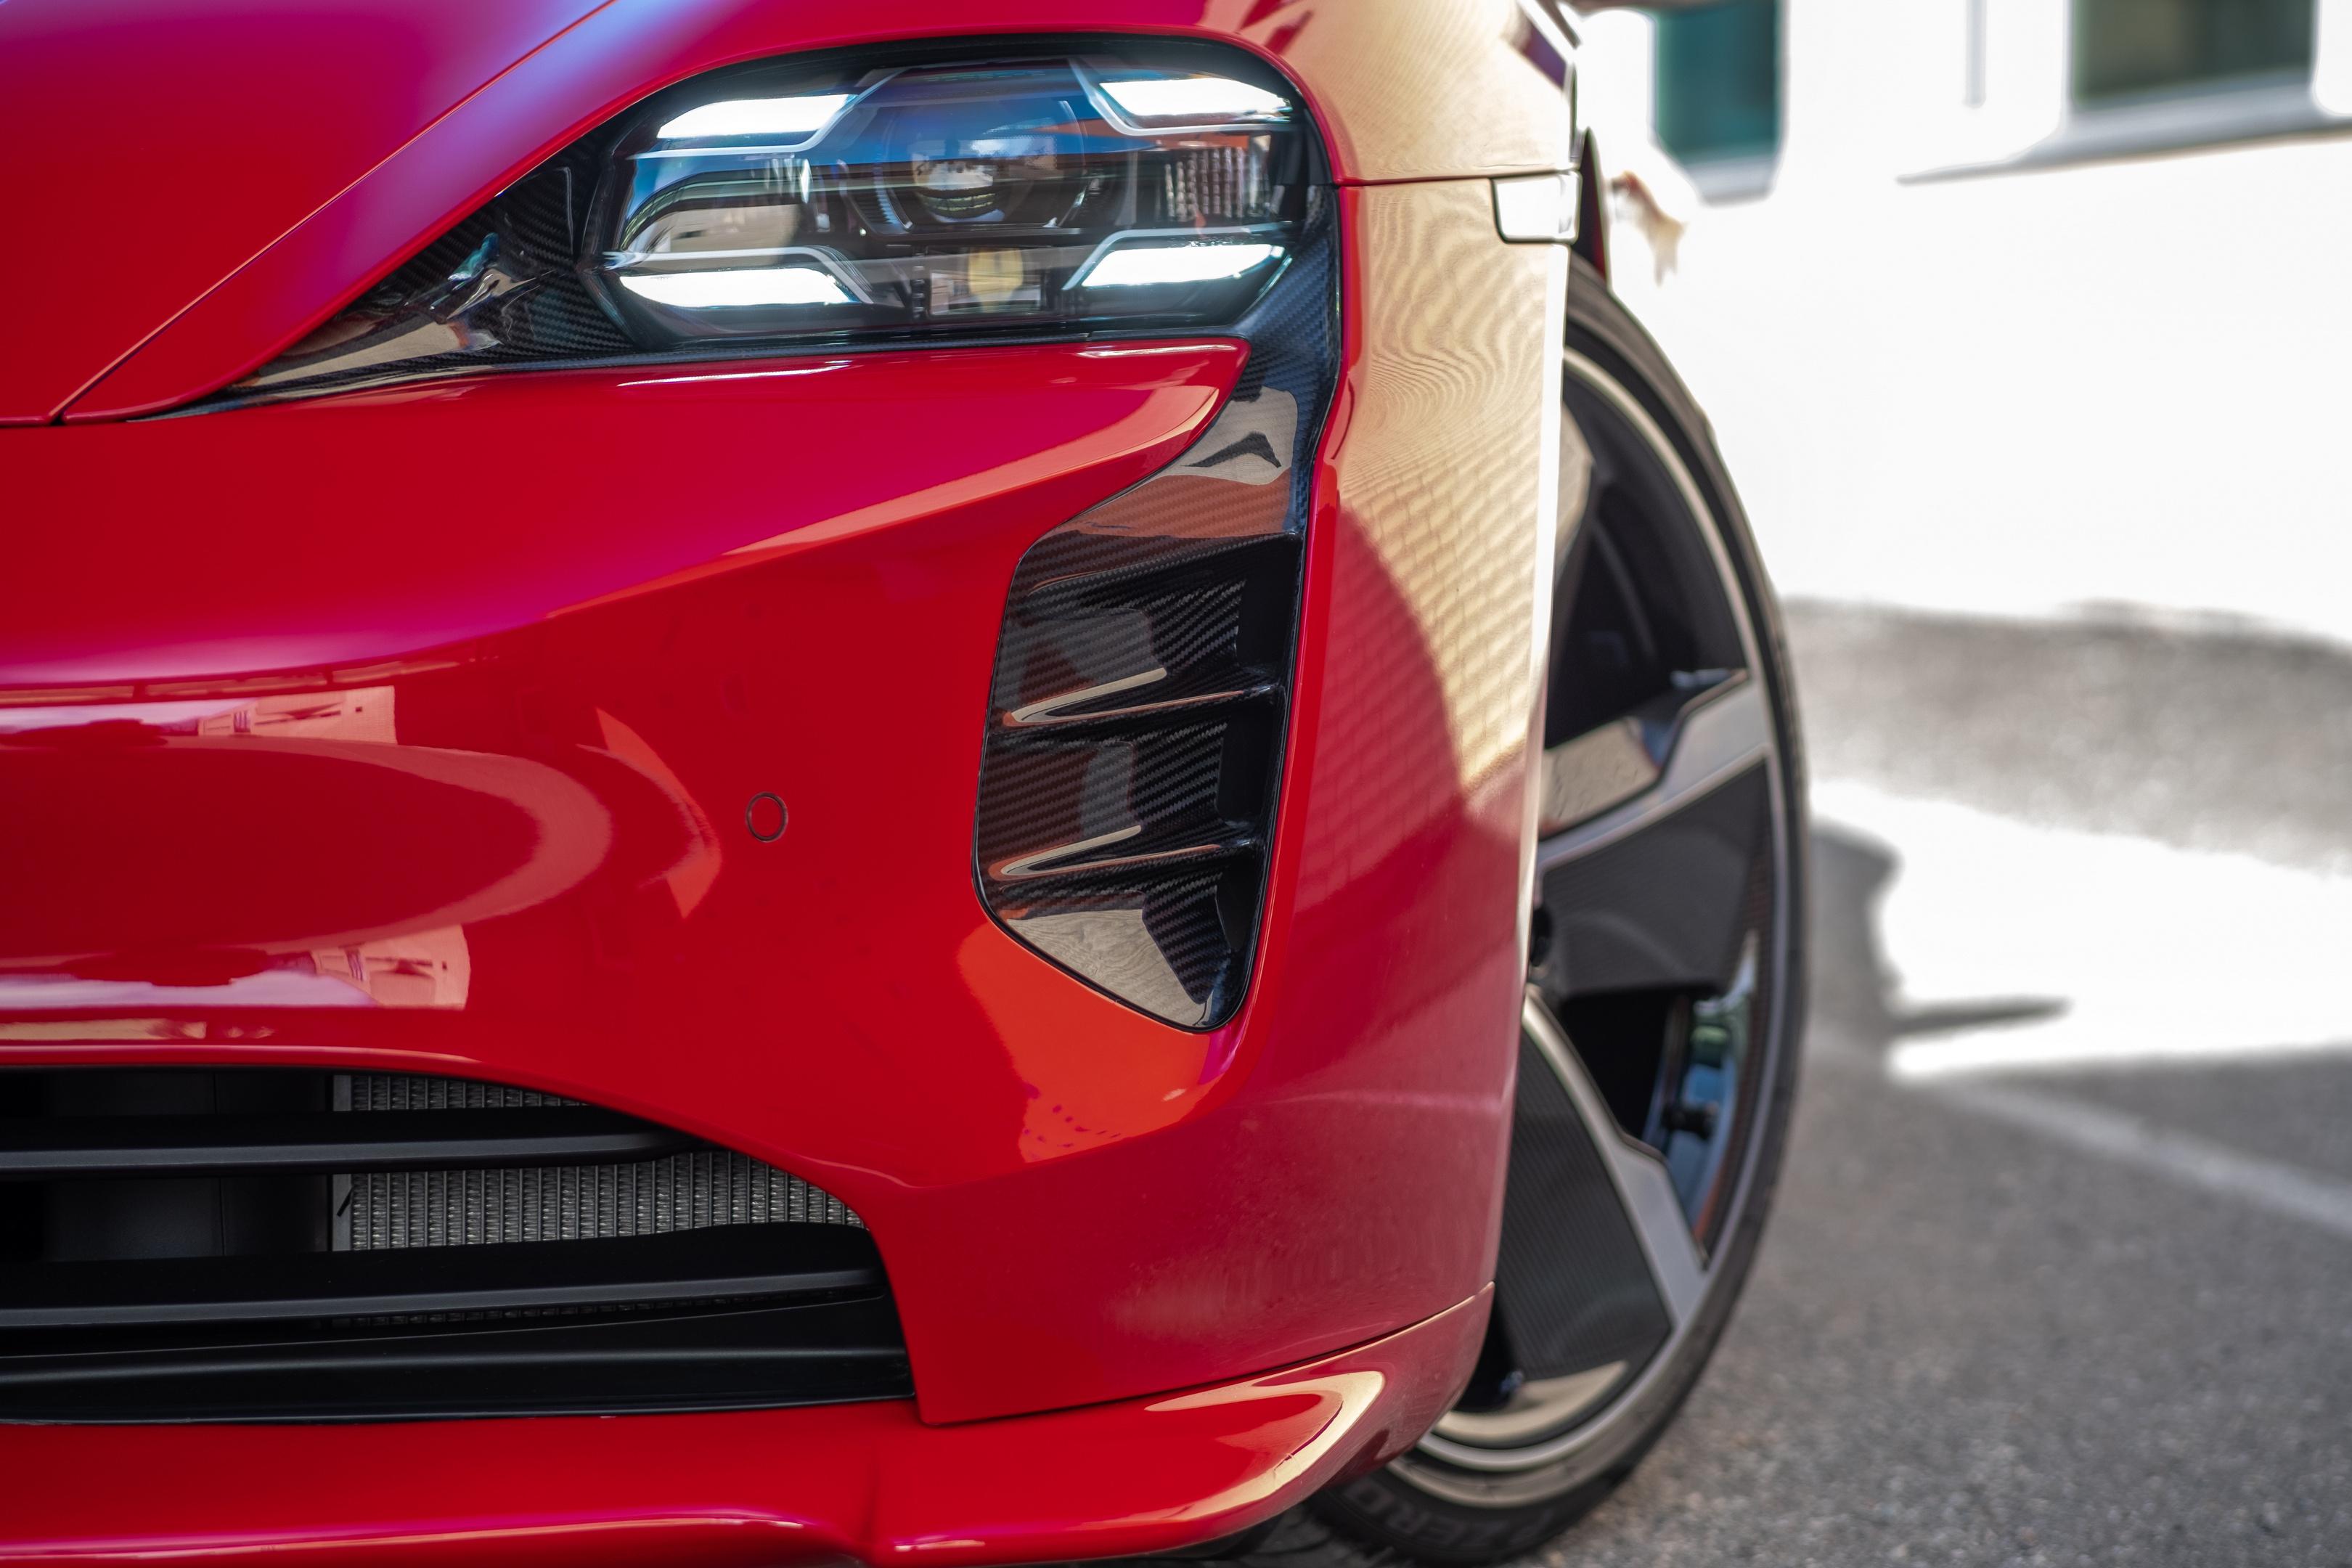 Zyrus Turbo S lightcovers